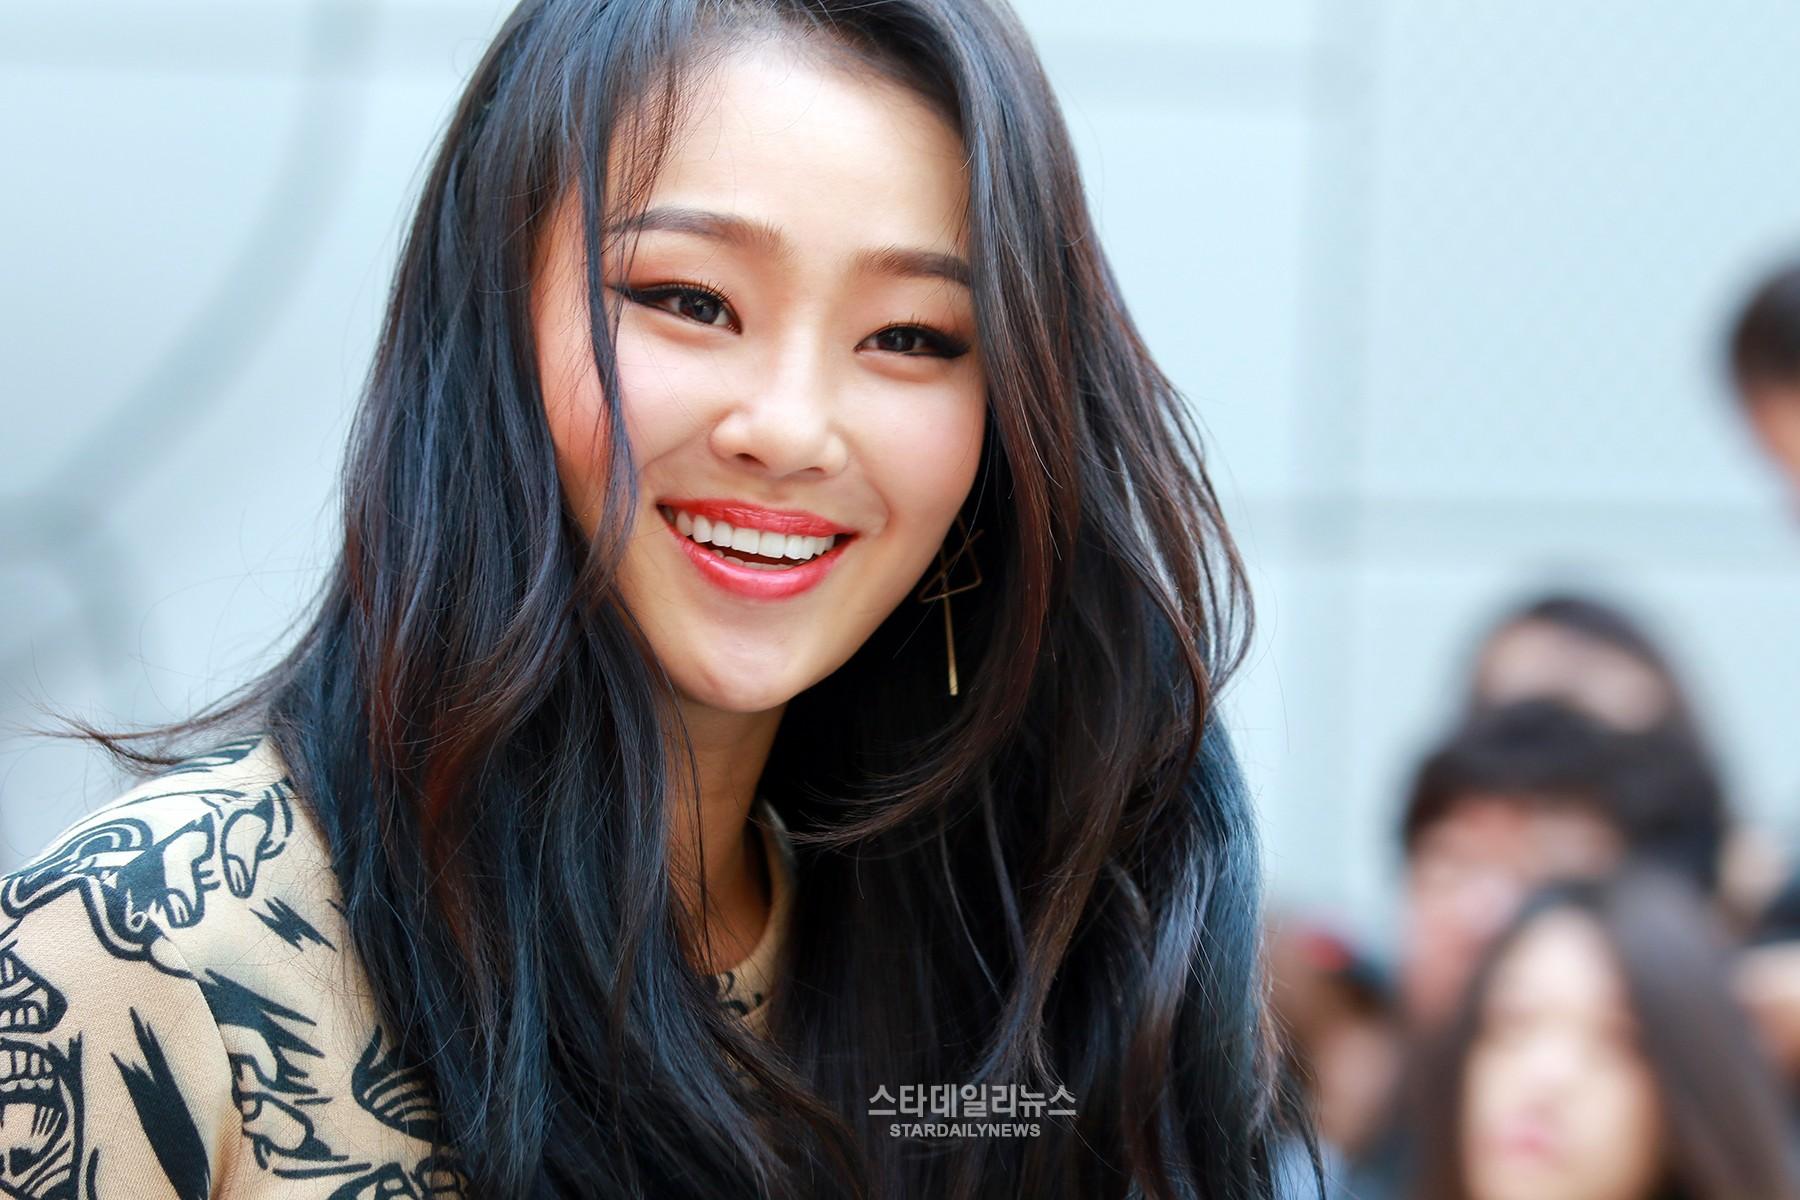 K-Pop Stars Gather at 2016 F/W Seoul Fashion Week in the Trendiest Styles